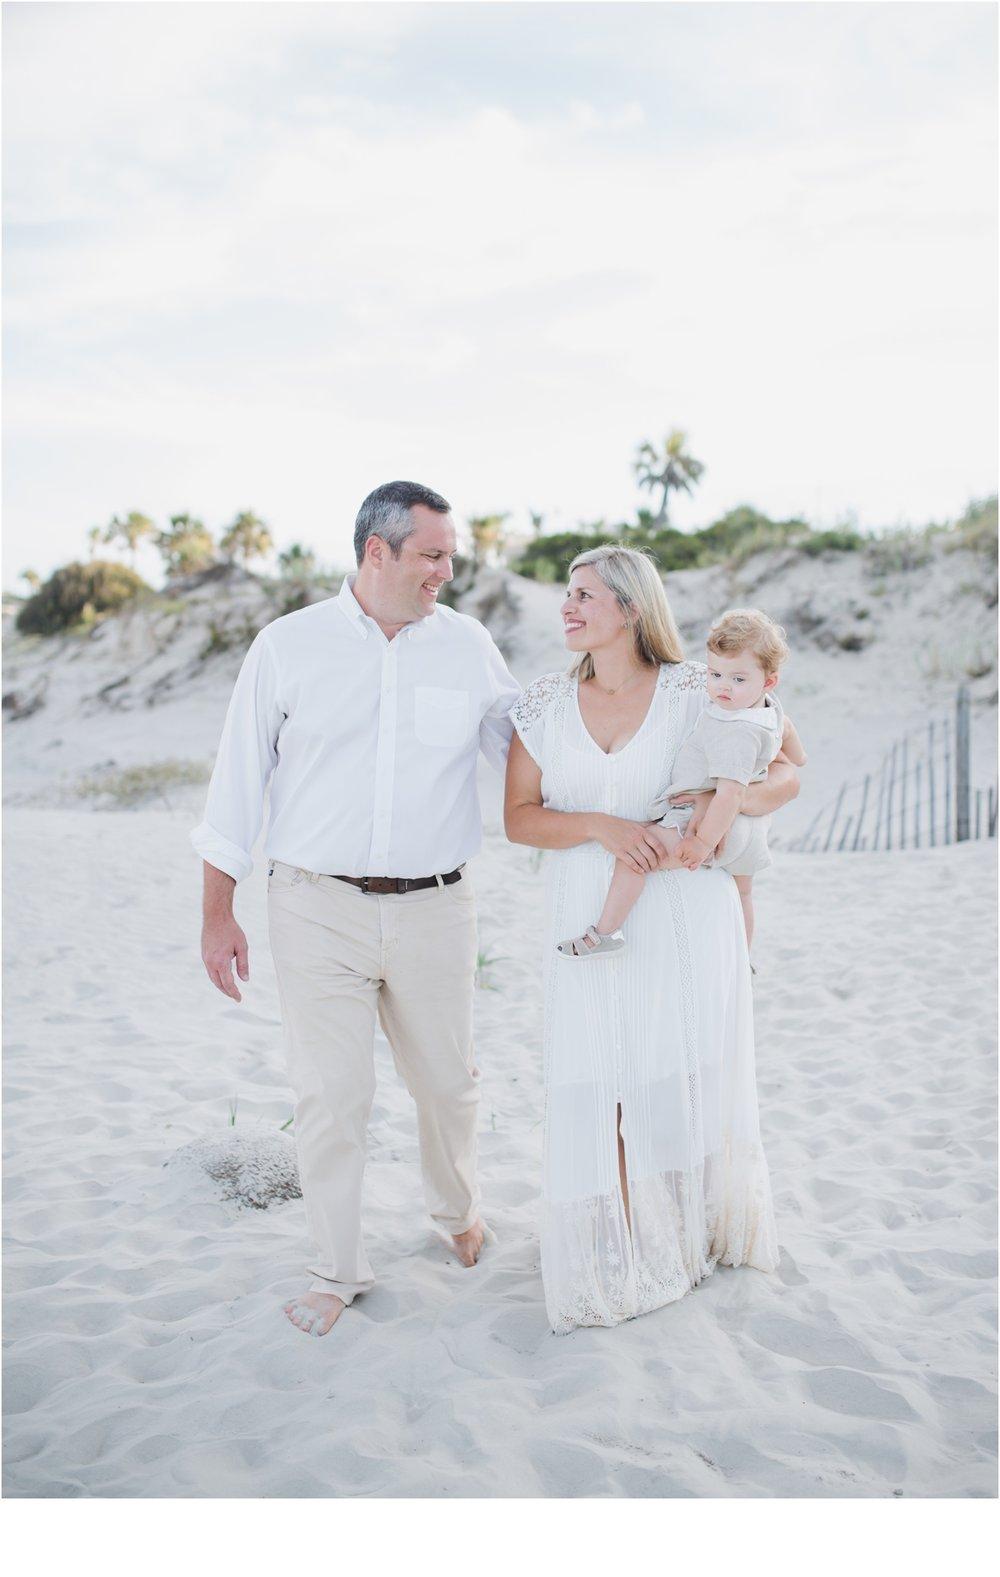 Rainey_Gregg_Photography_St._Simons_Island_Georgia_California_Wedding_Portrait_Photography_1022.jpg